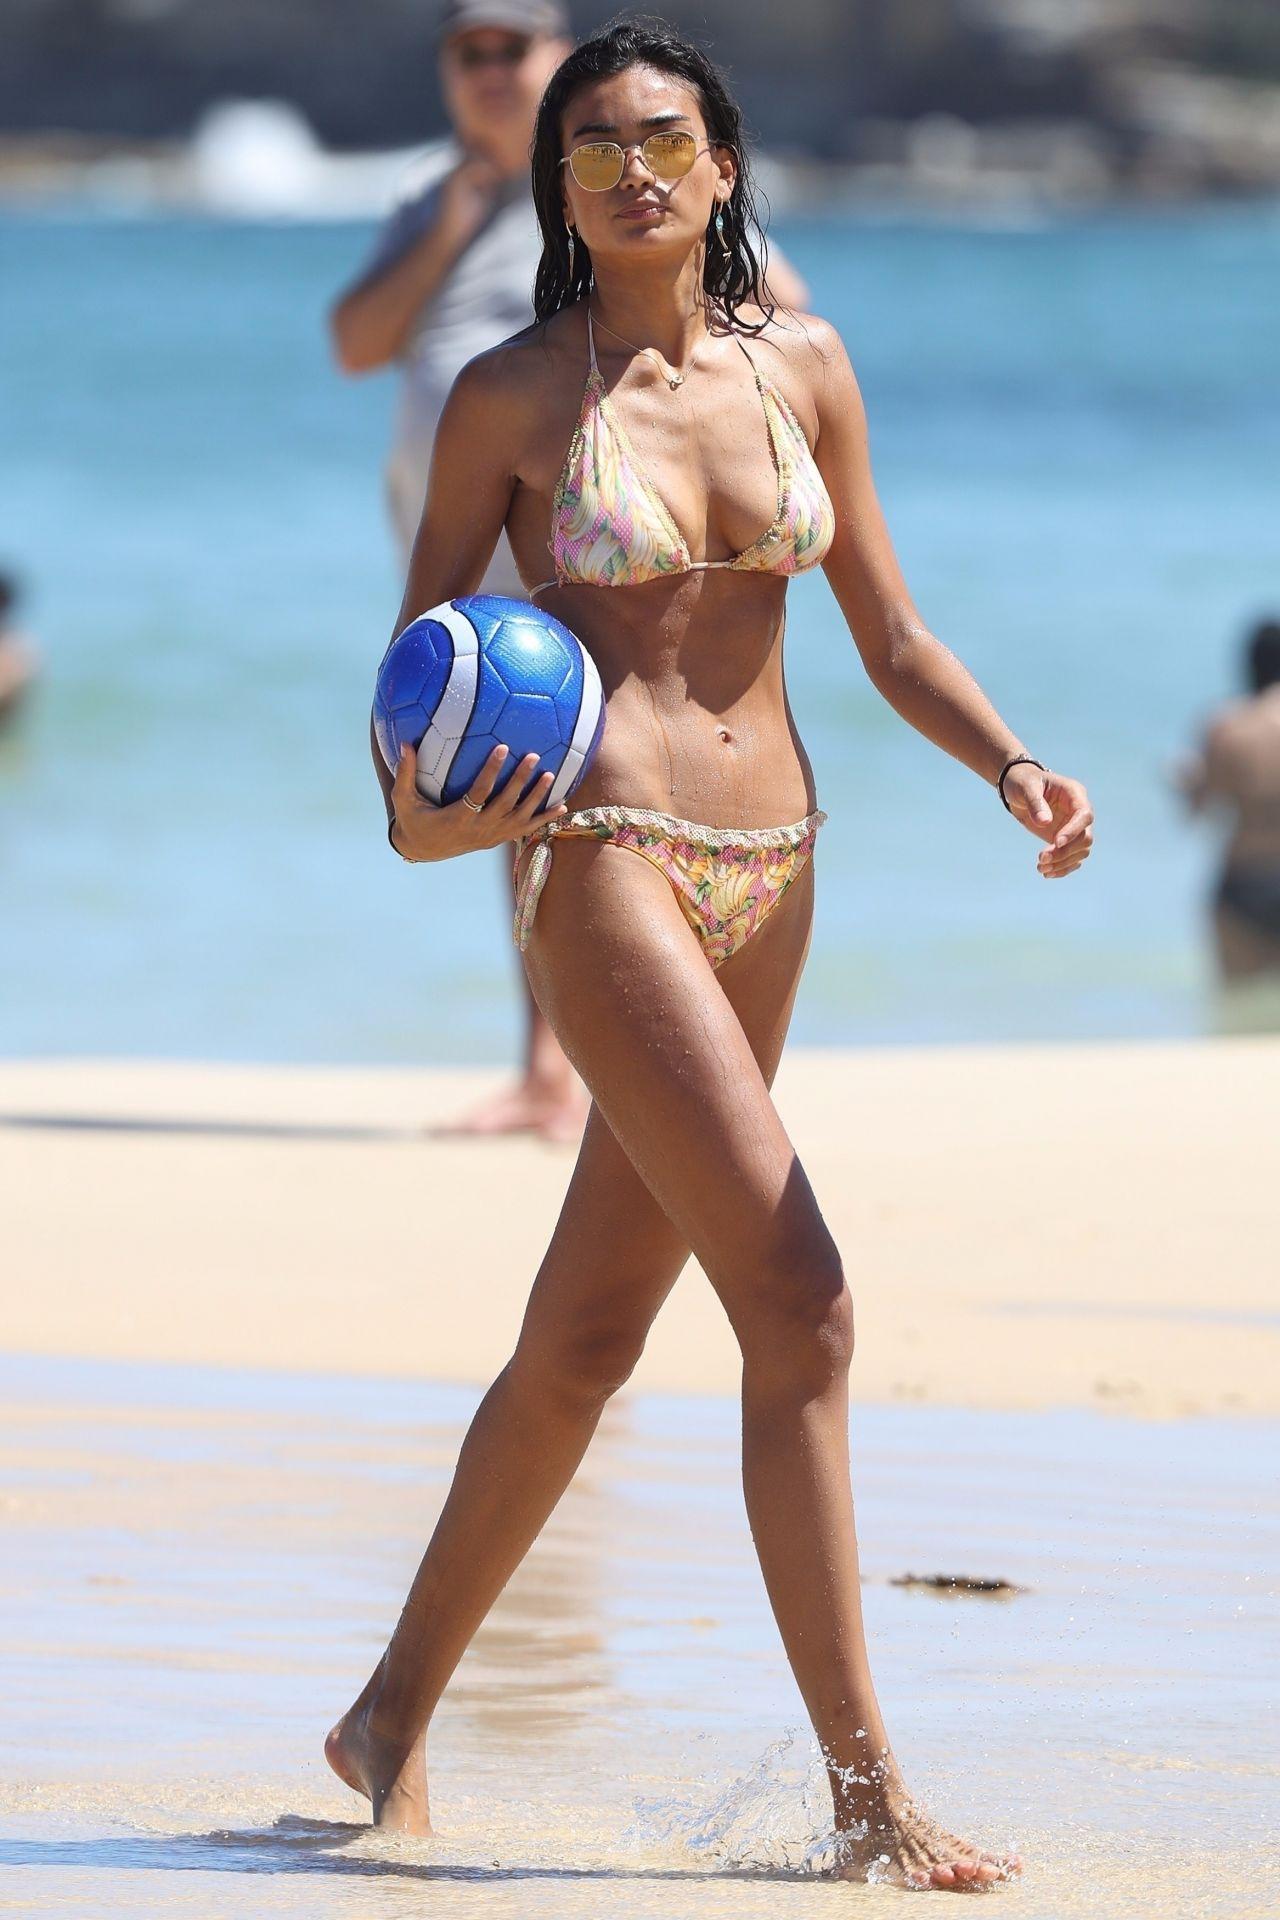 Kelly Gale in Bikini on Bondi Beach in Sydney Pic 19 of 35